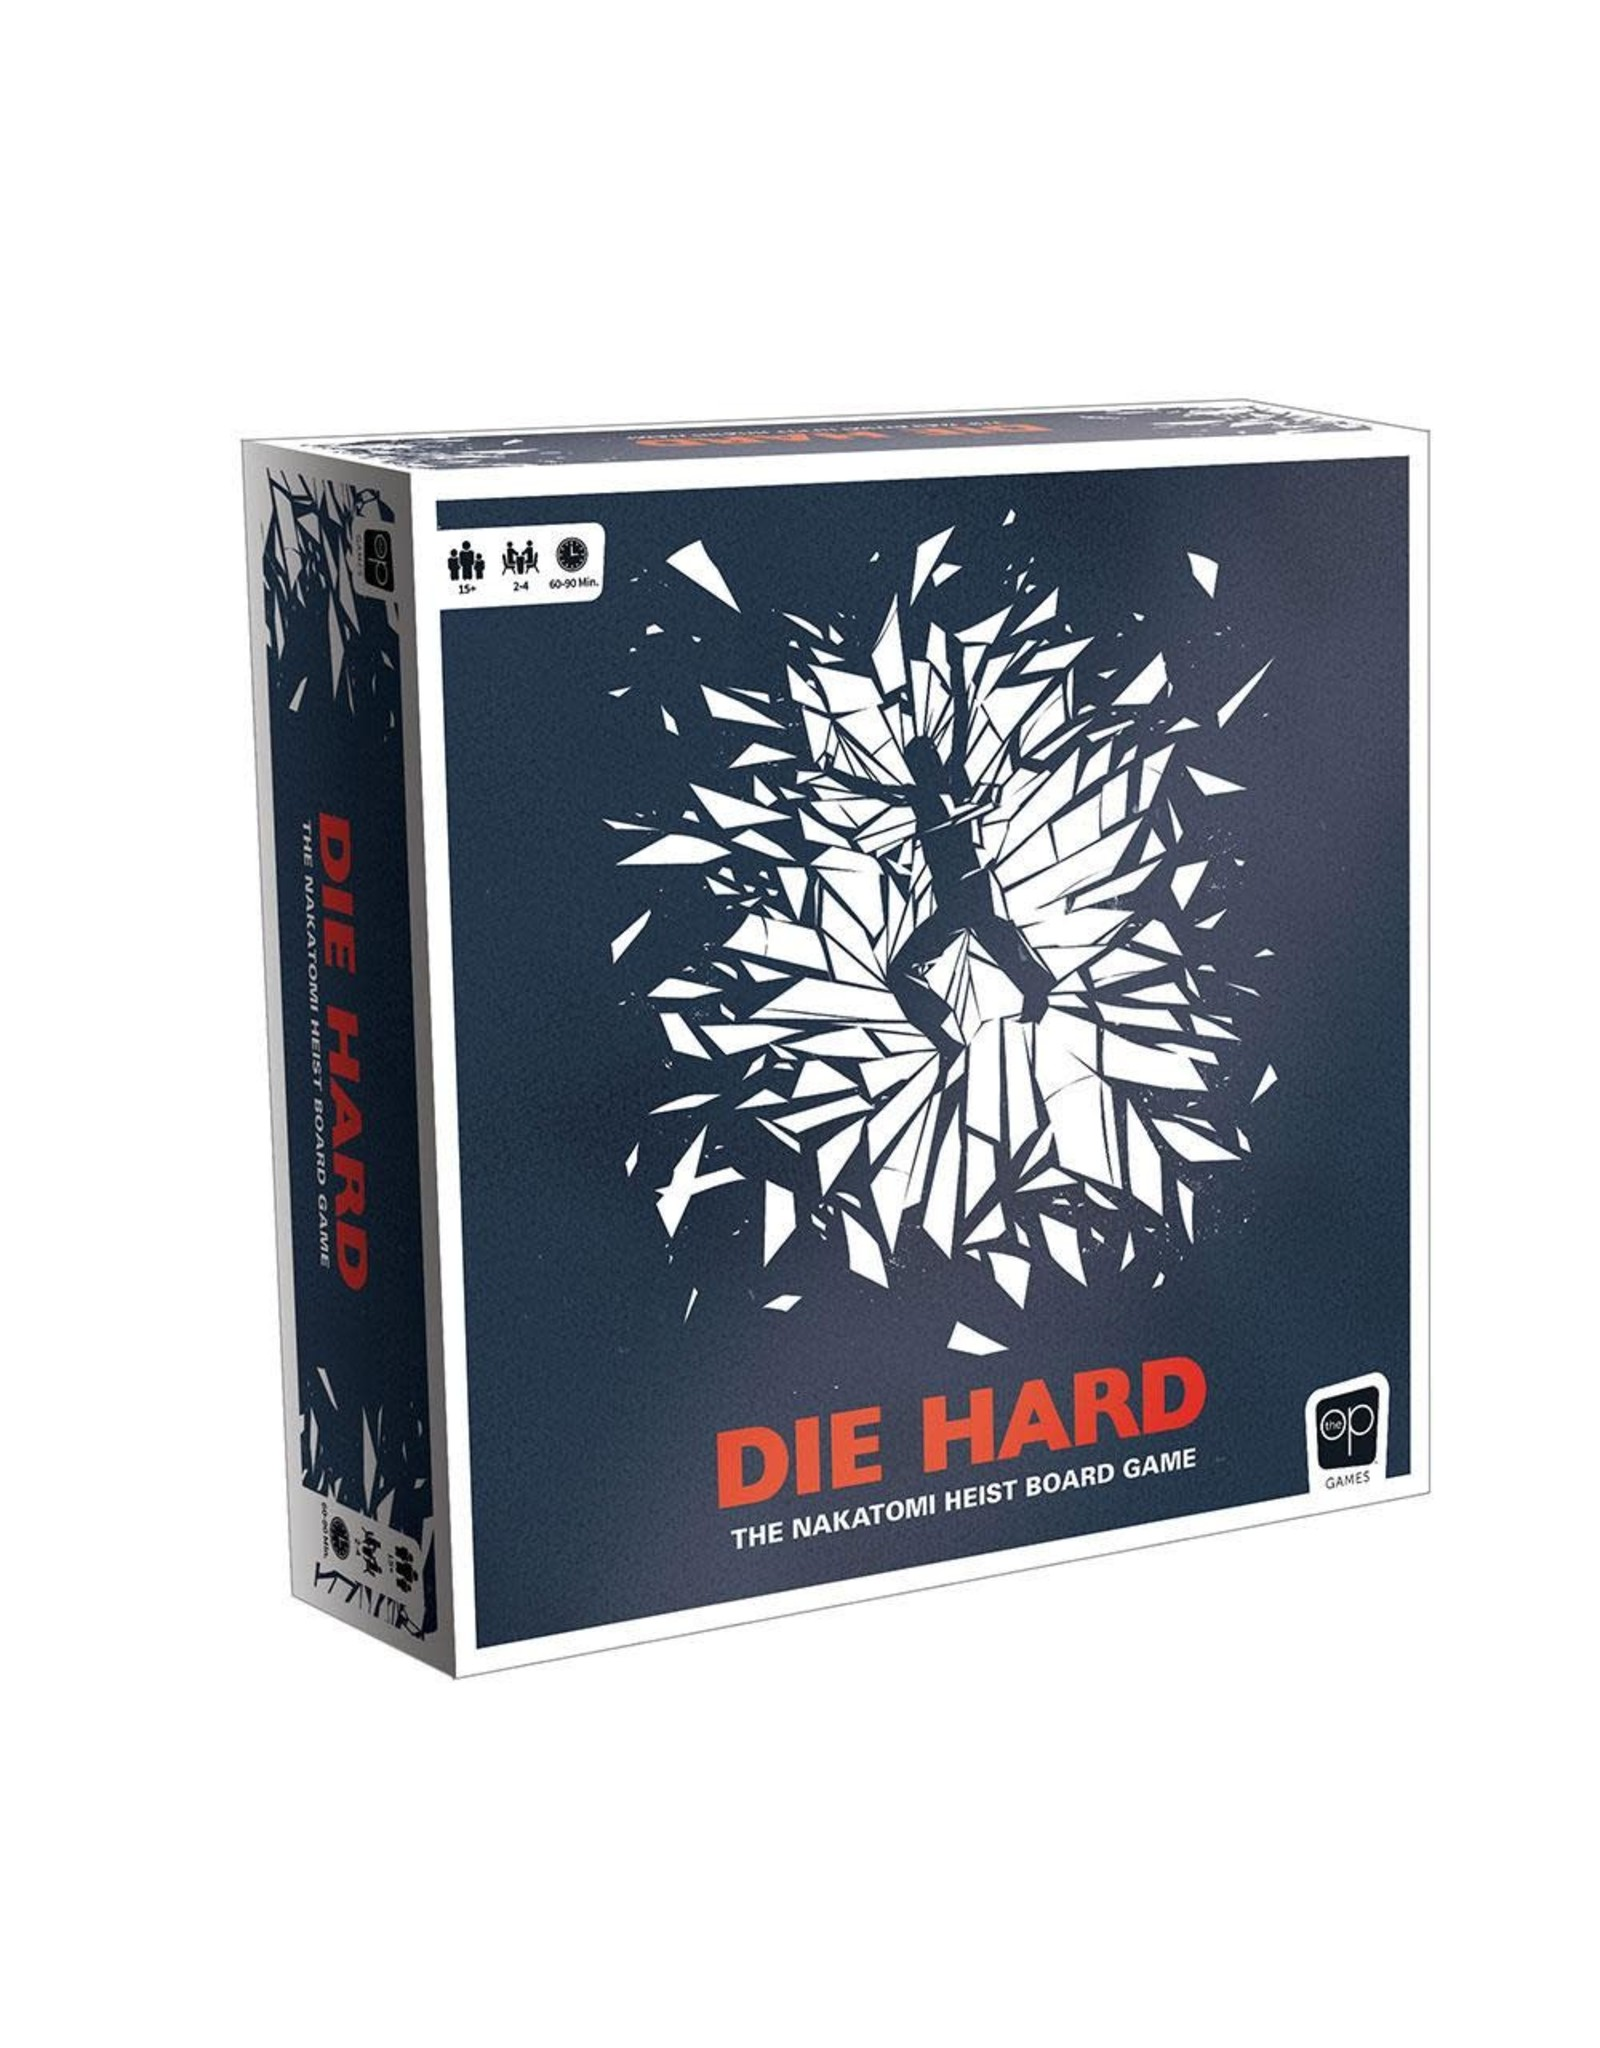 USAopoly DIE HARD Board Game - The Nakatomi Heist